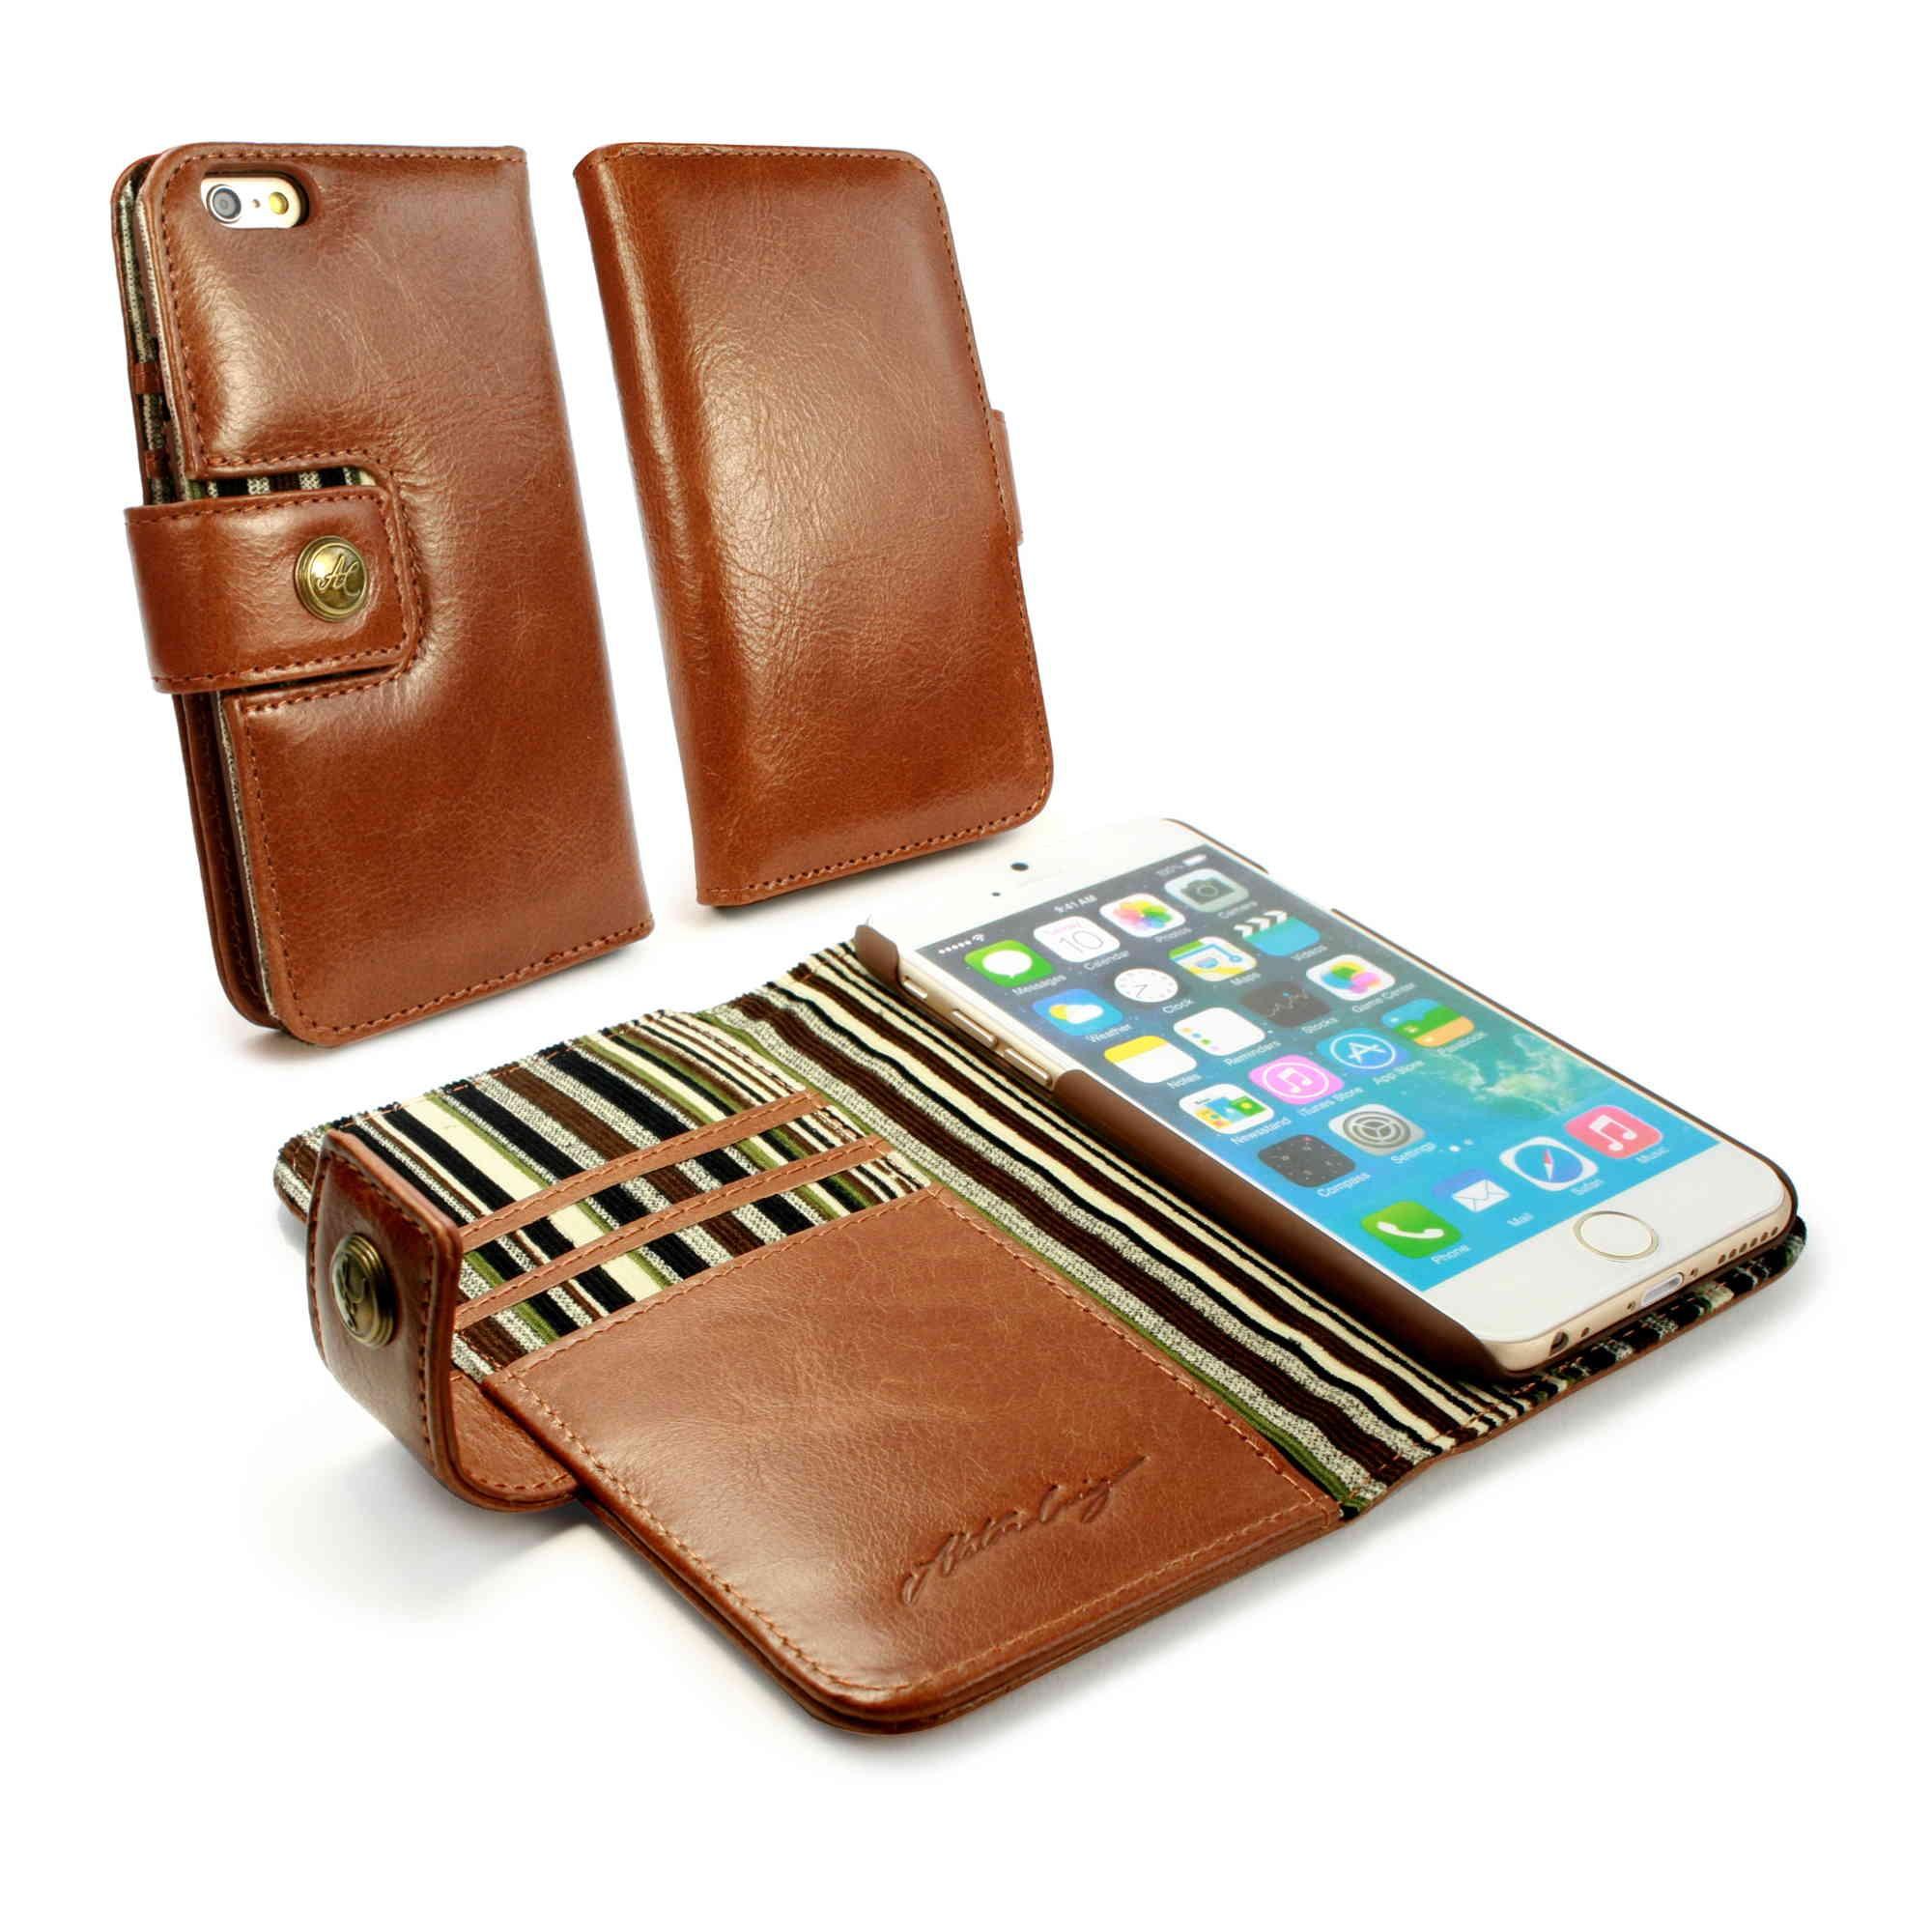 Alston Craig Alston Craig Personalised Genuine Leather Wallet Case